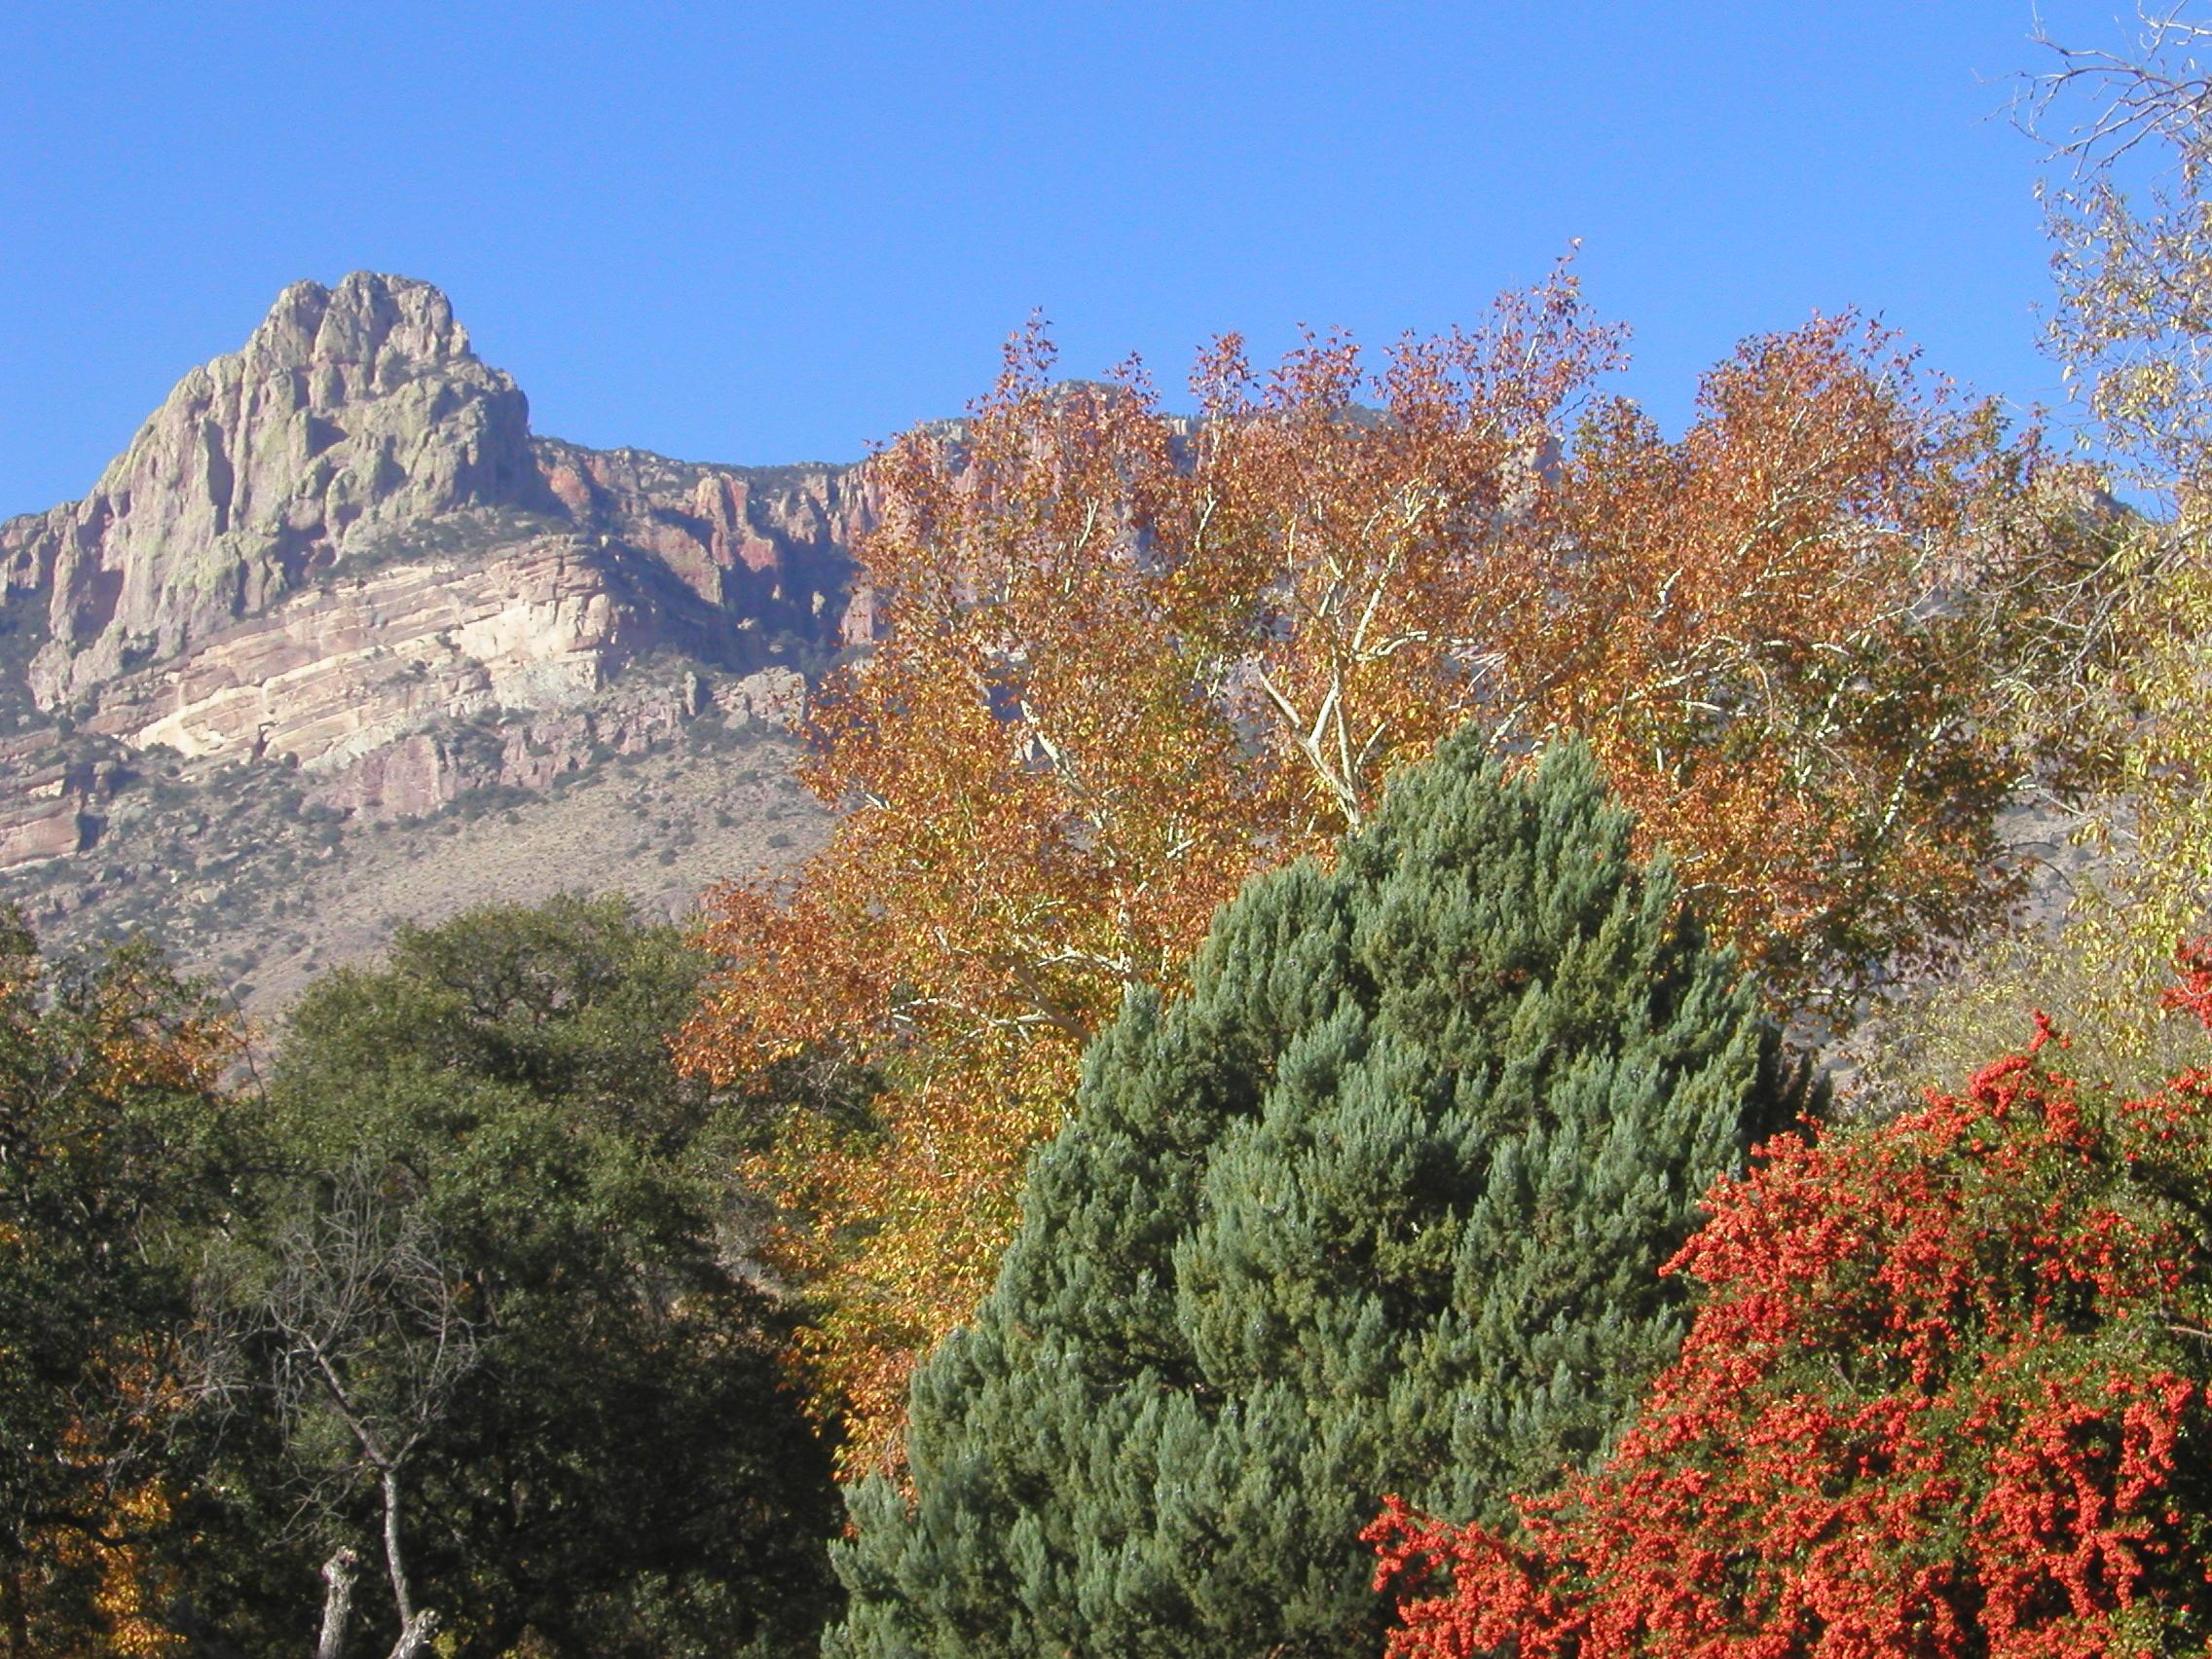 Fall Chircahua Mountains, Cave Creek Canyon